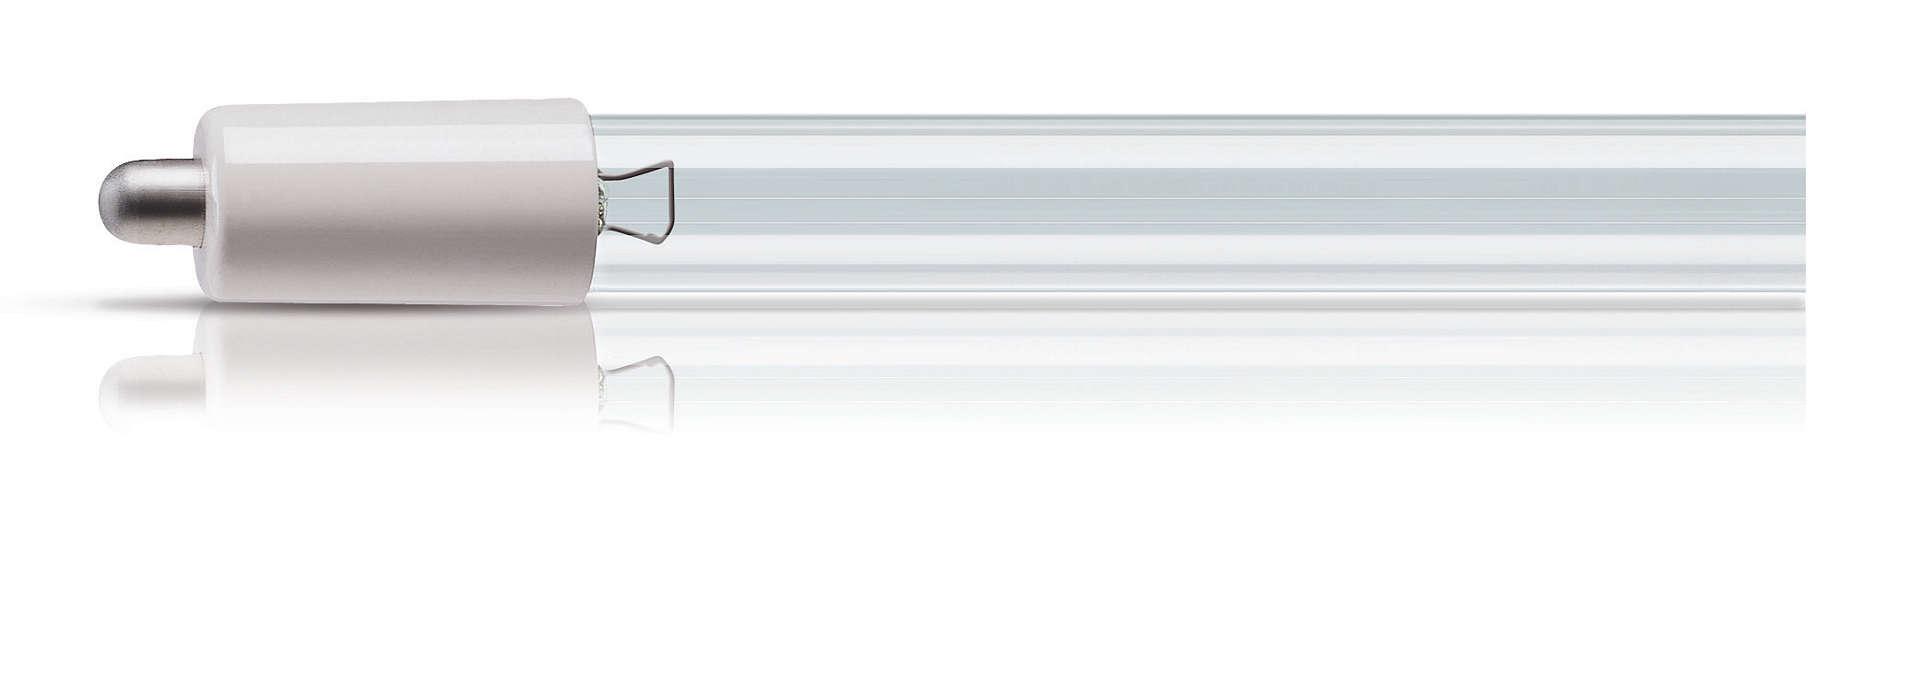 TUV T5